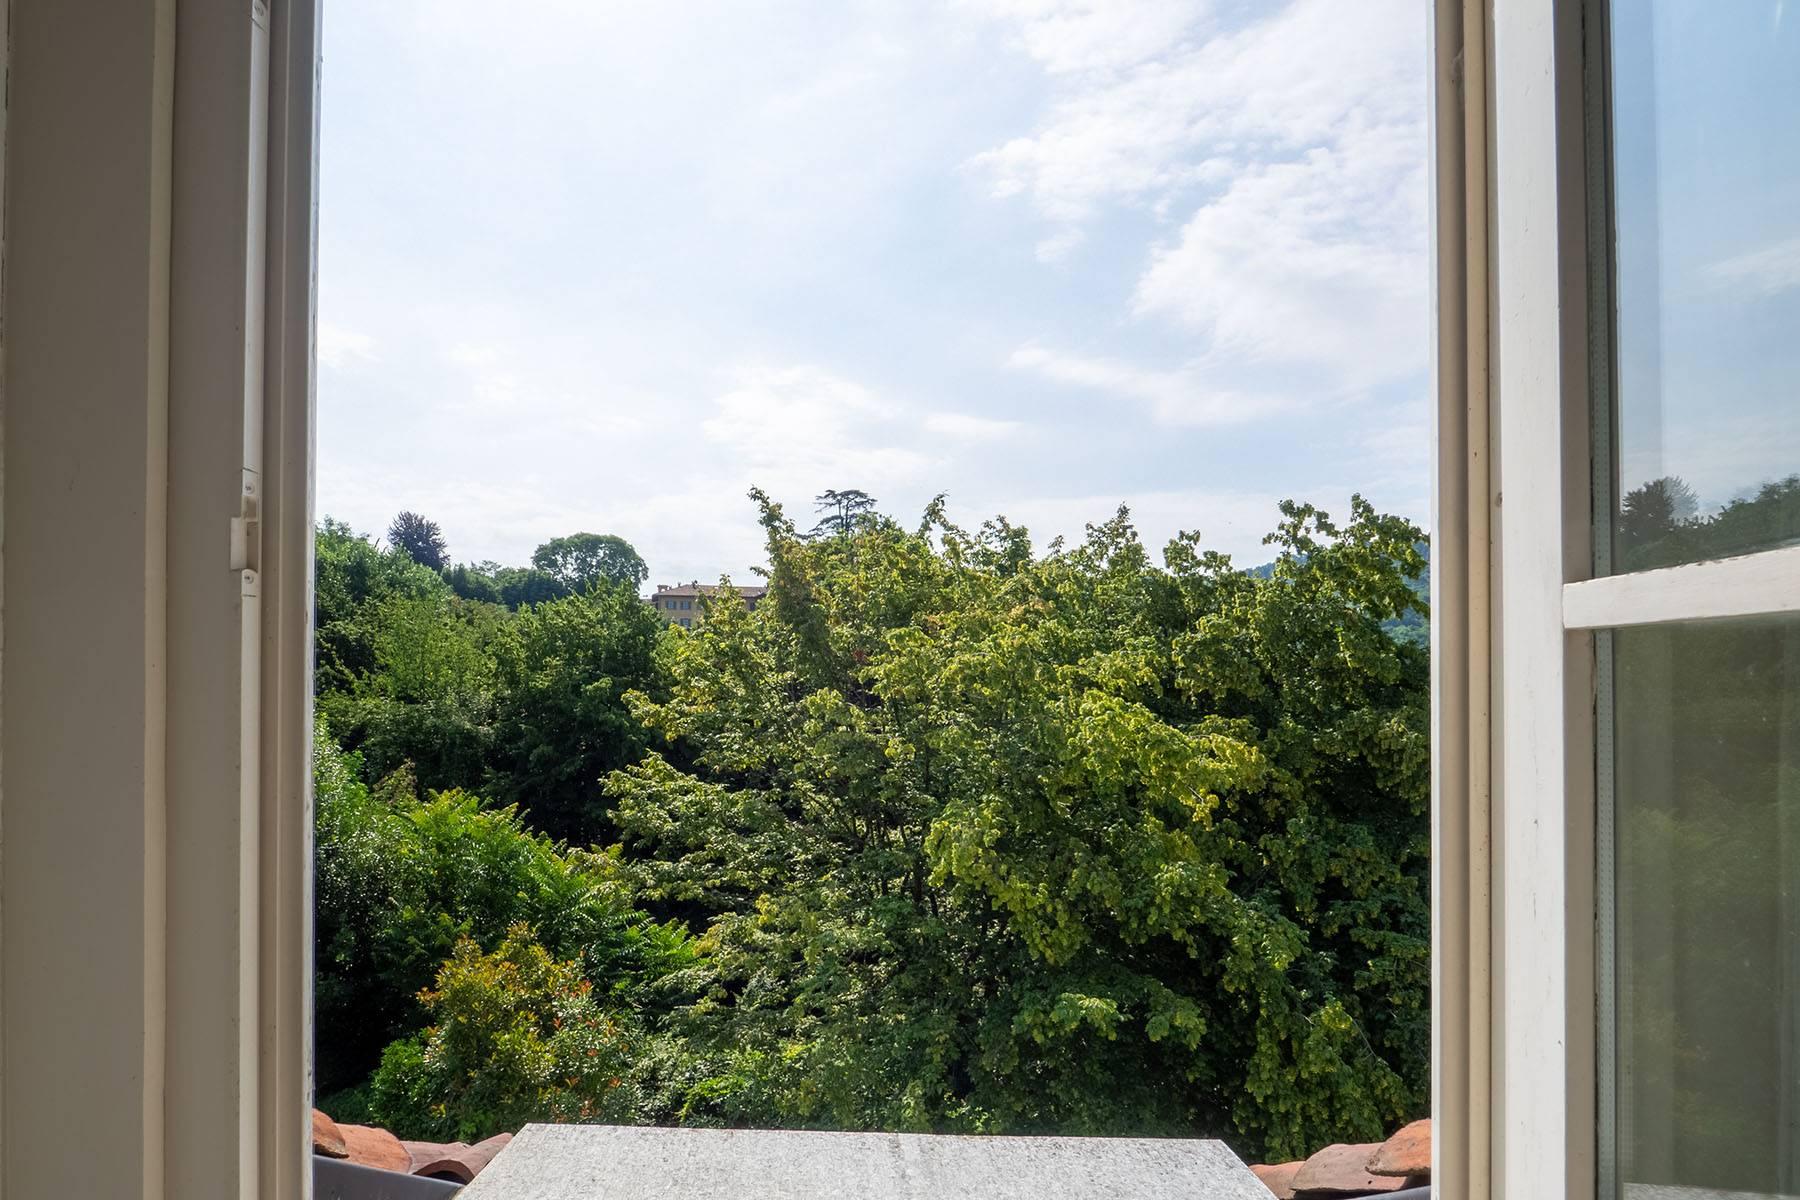 Casa indipendente in Vendita a Torino: 5 locali, 400 mq - Foto 12